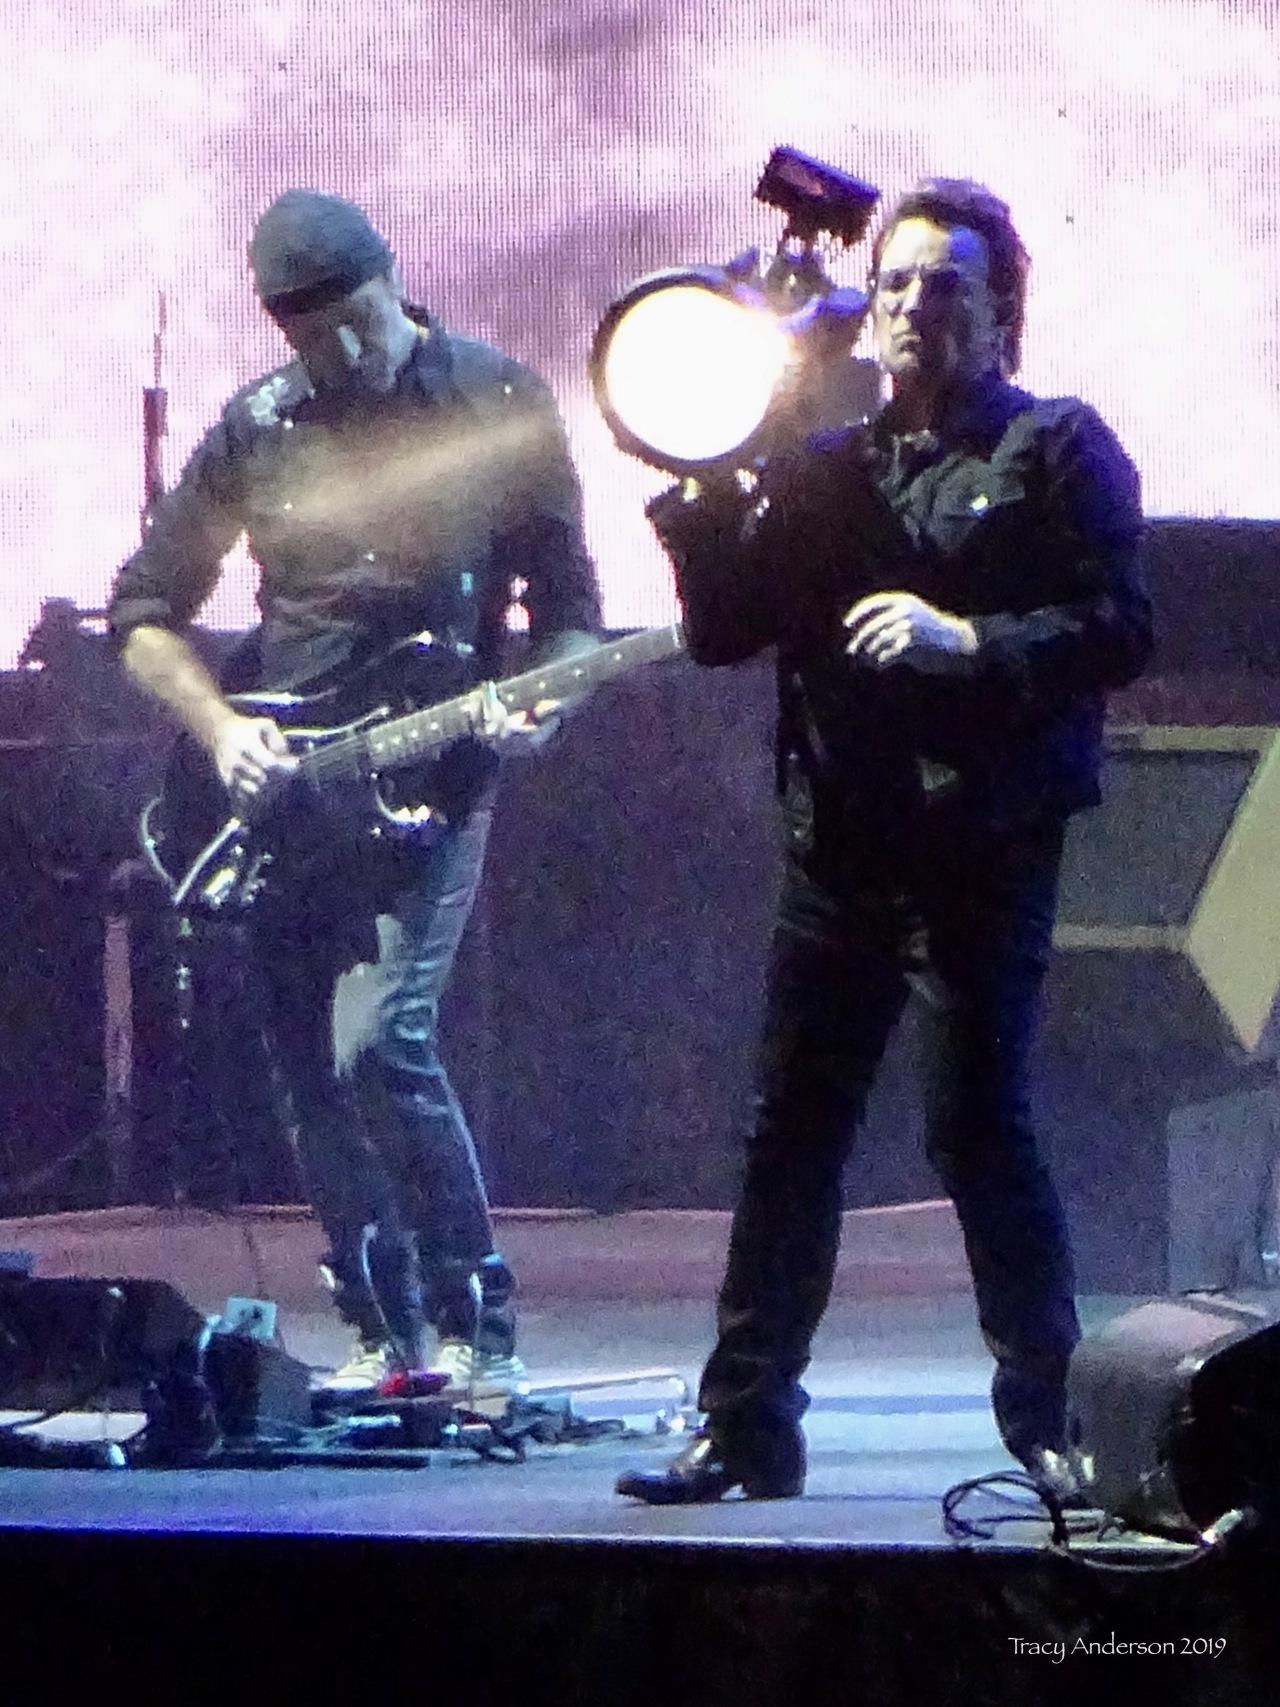 Bono and The Edge BTBS light U2 The Joshua Tree Tour Perth Nov 27 2019